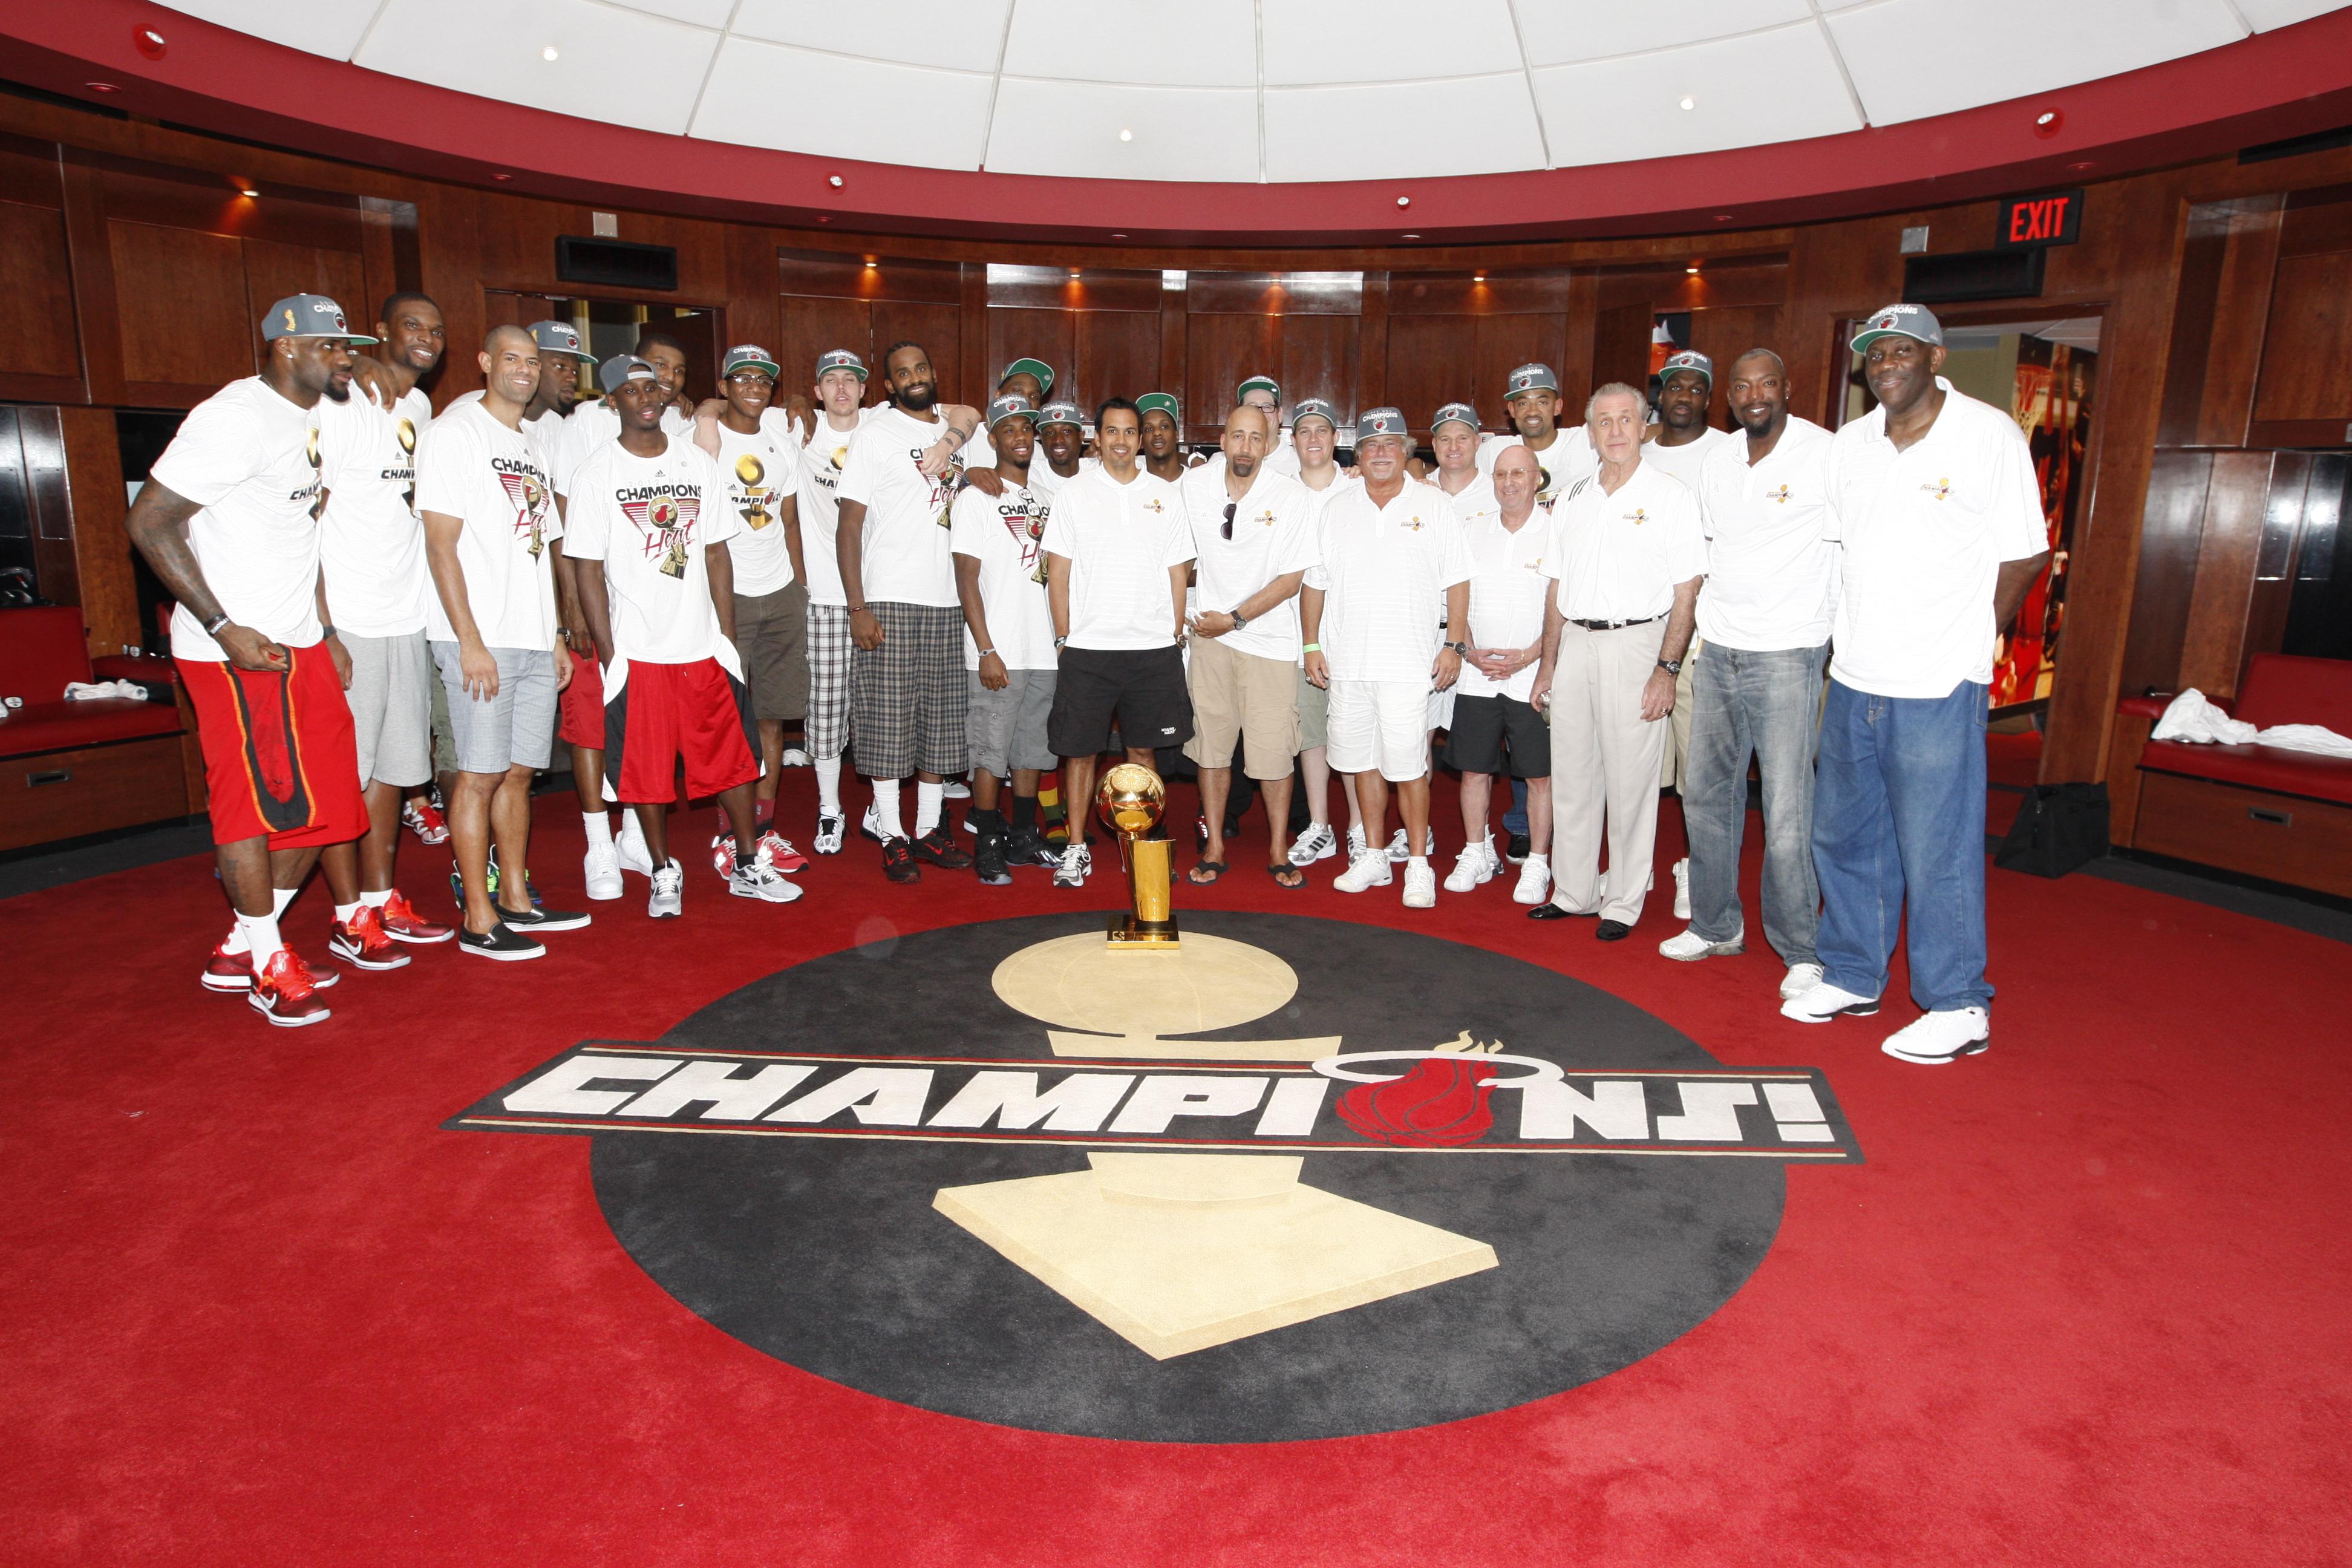 Miami Heat, 2012